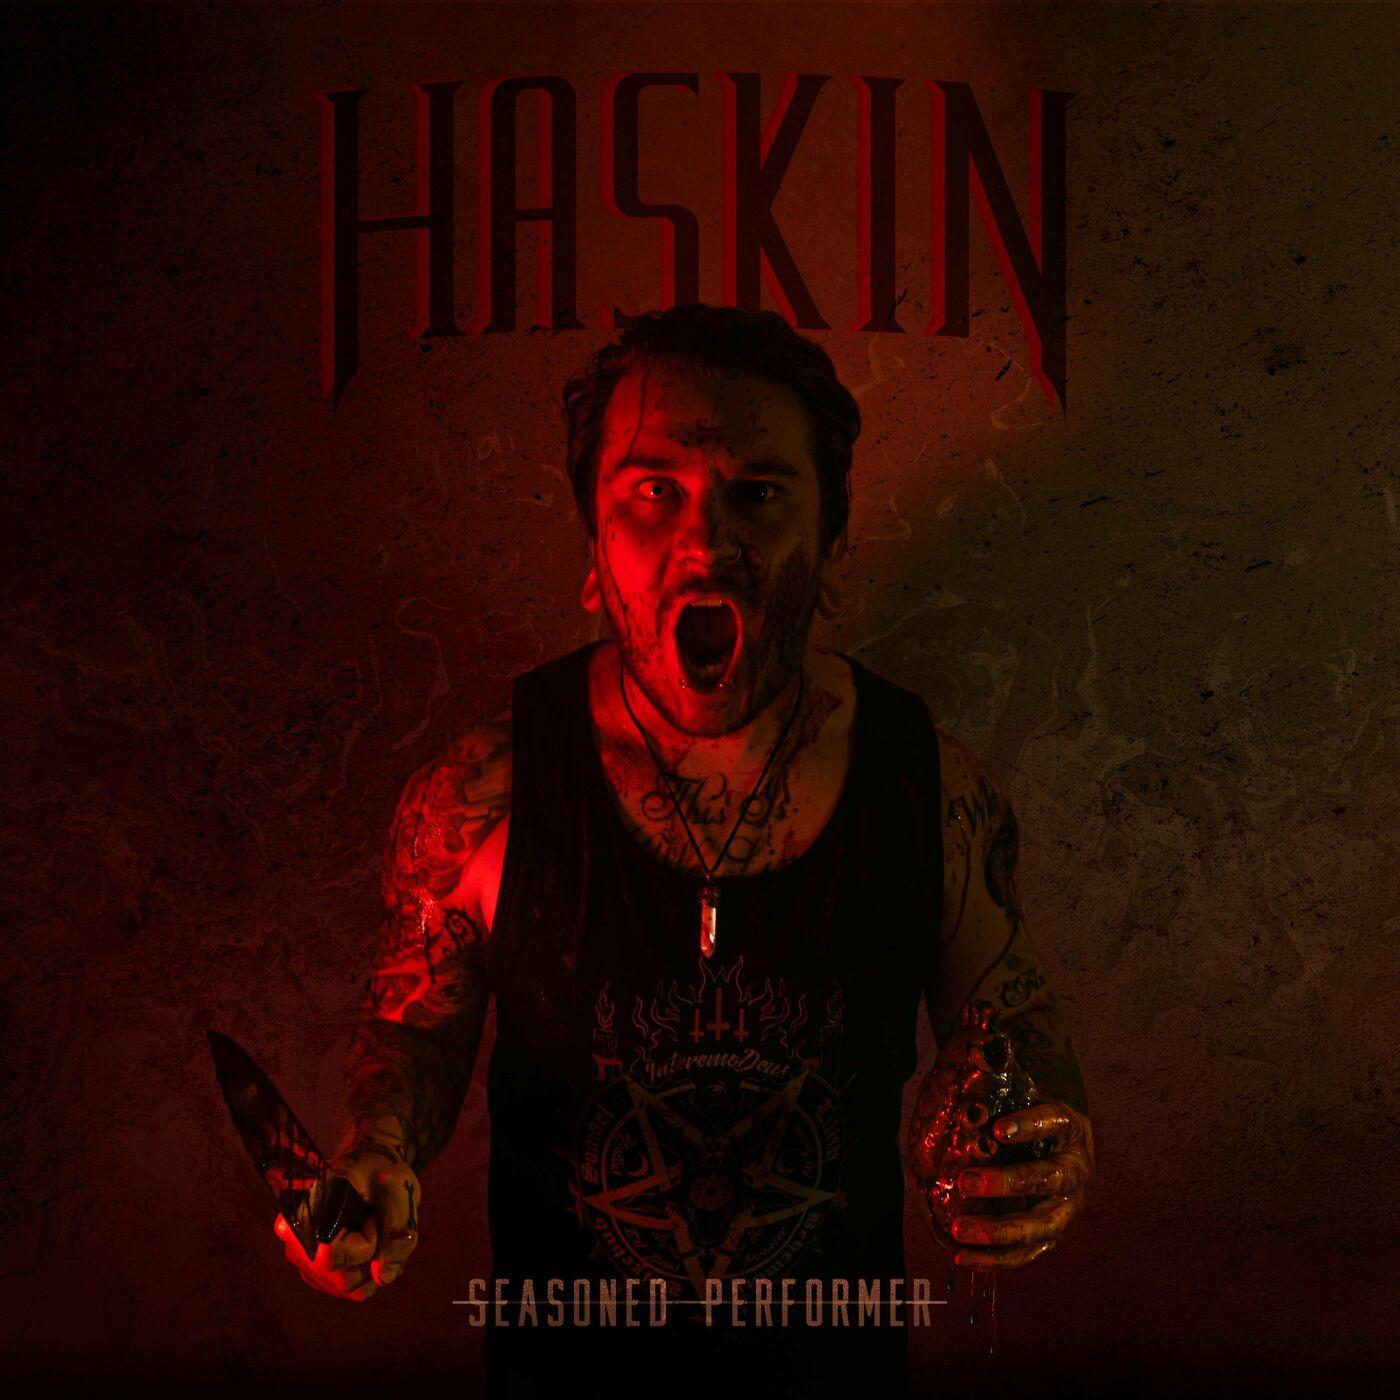 Haskin - Seasoned Performer [EP] (2020)